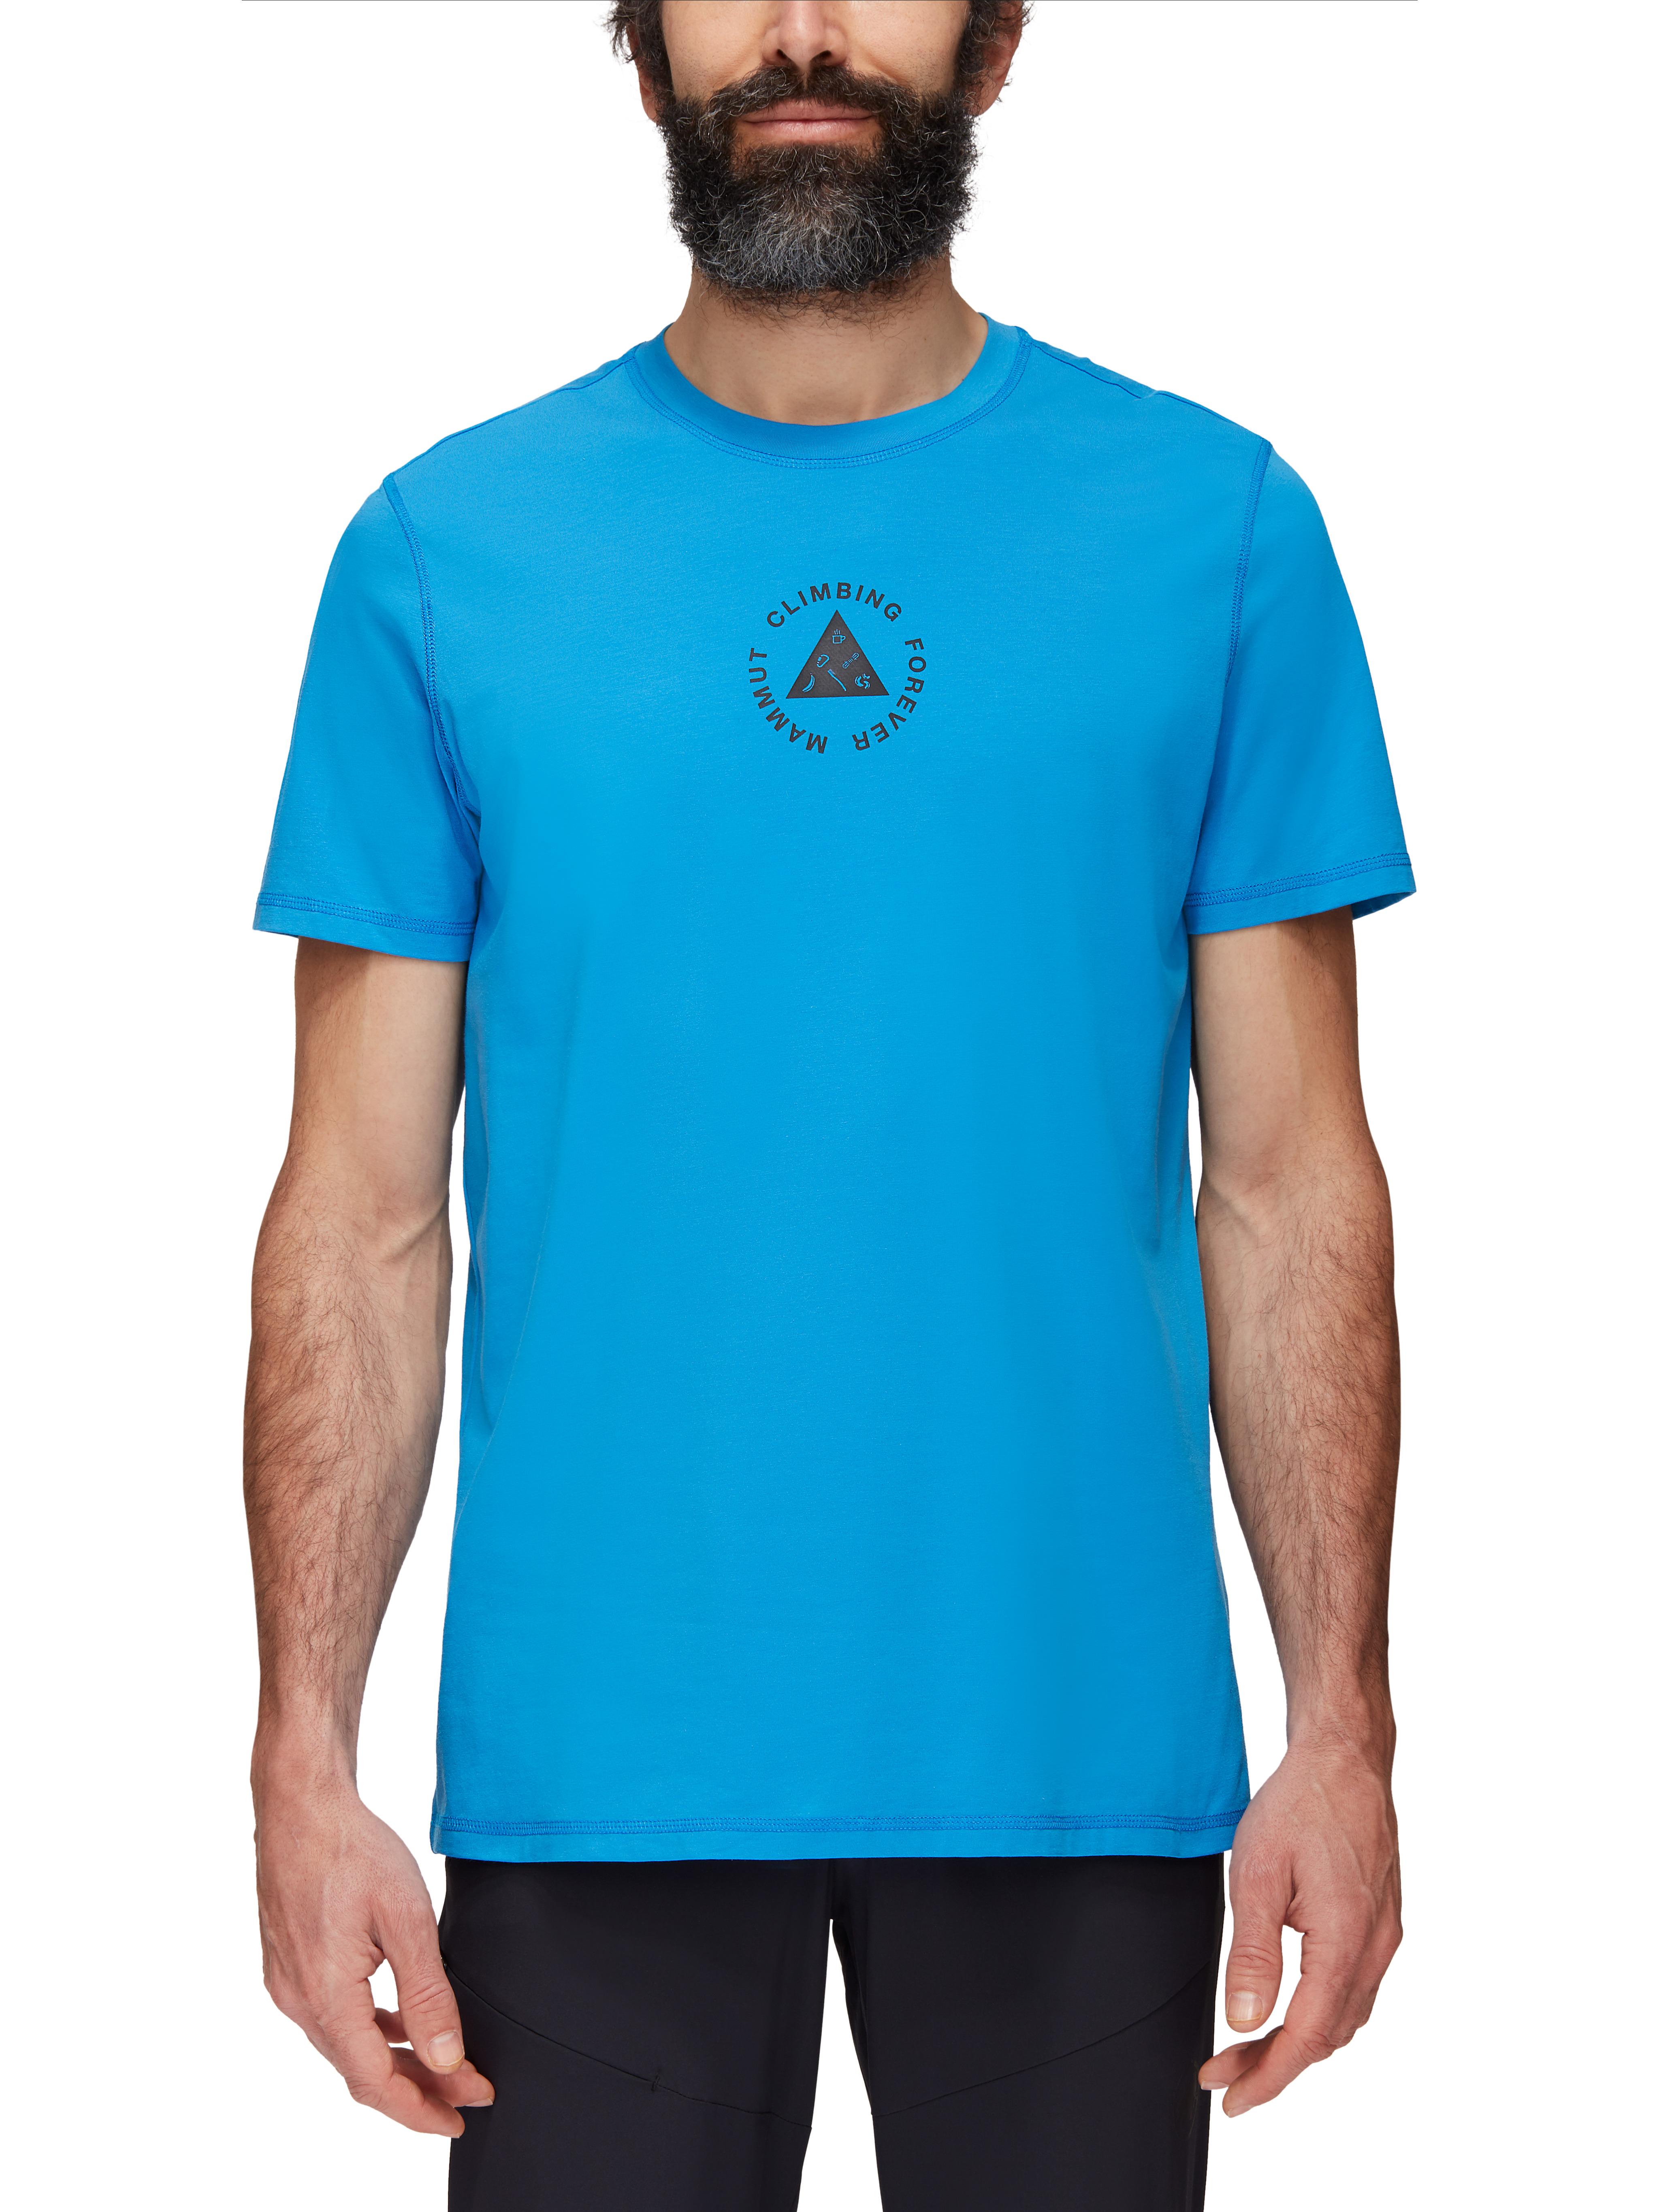 Massone T-Shirt Men product image